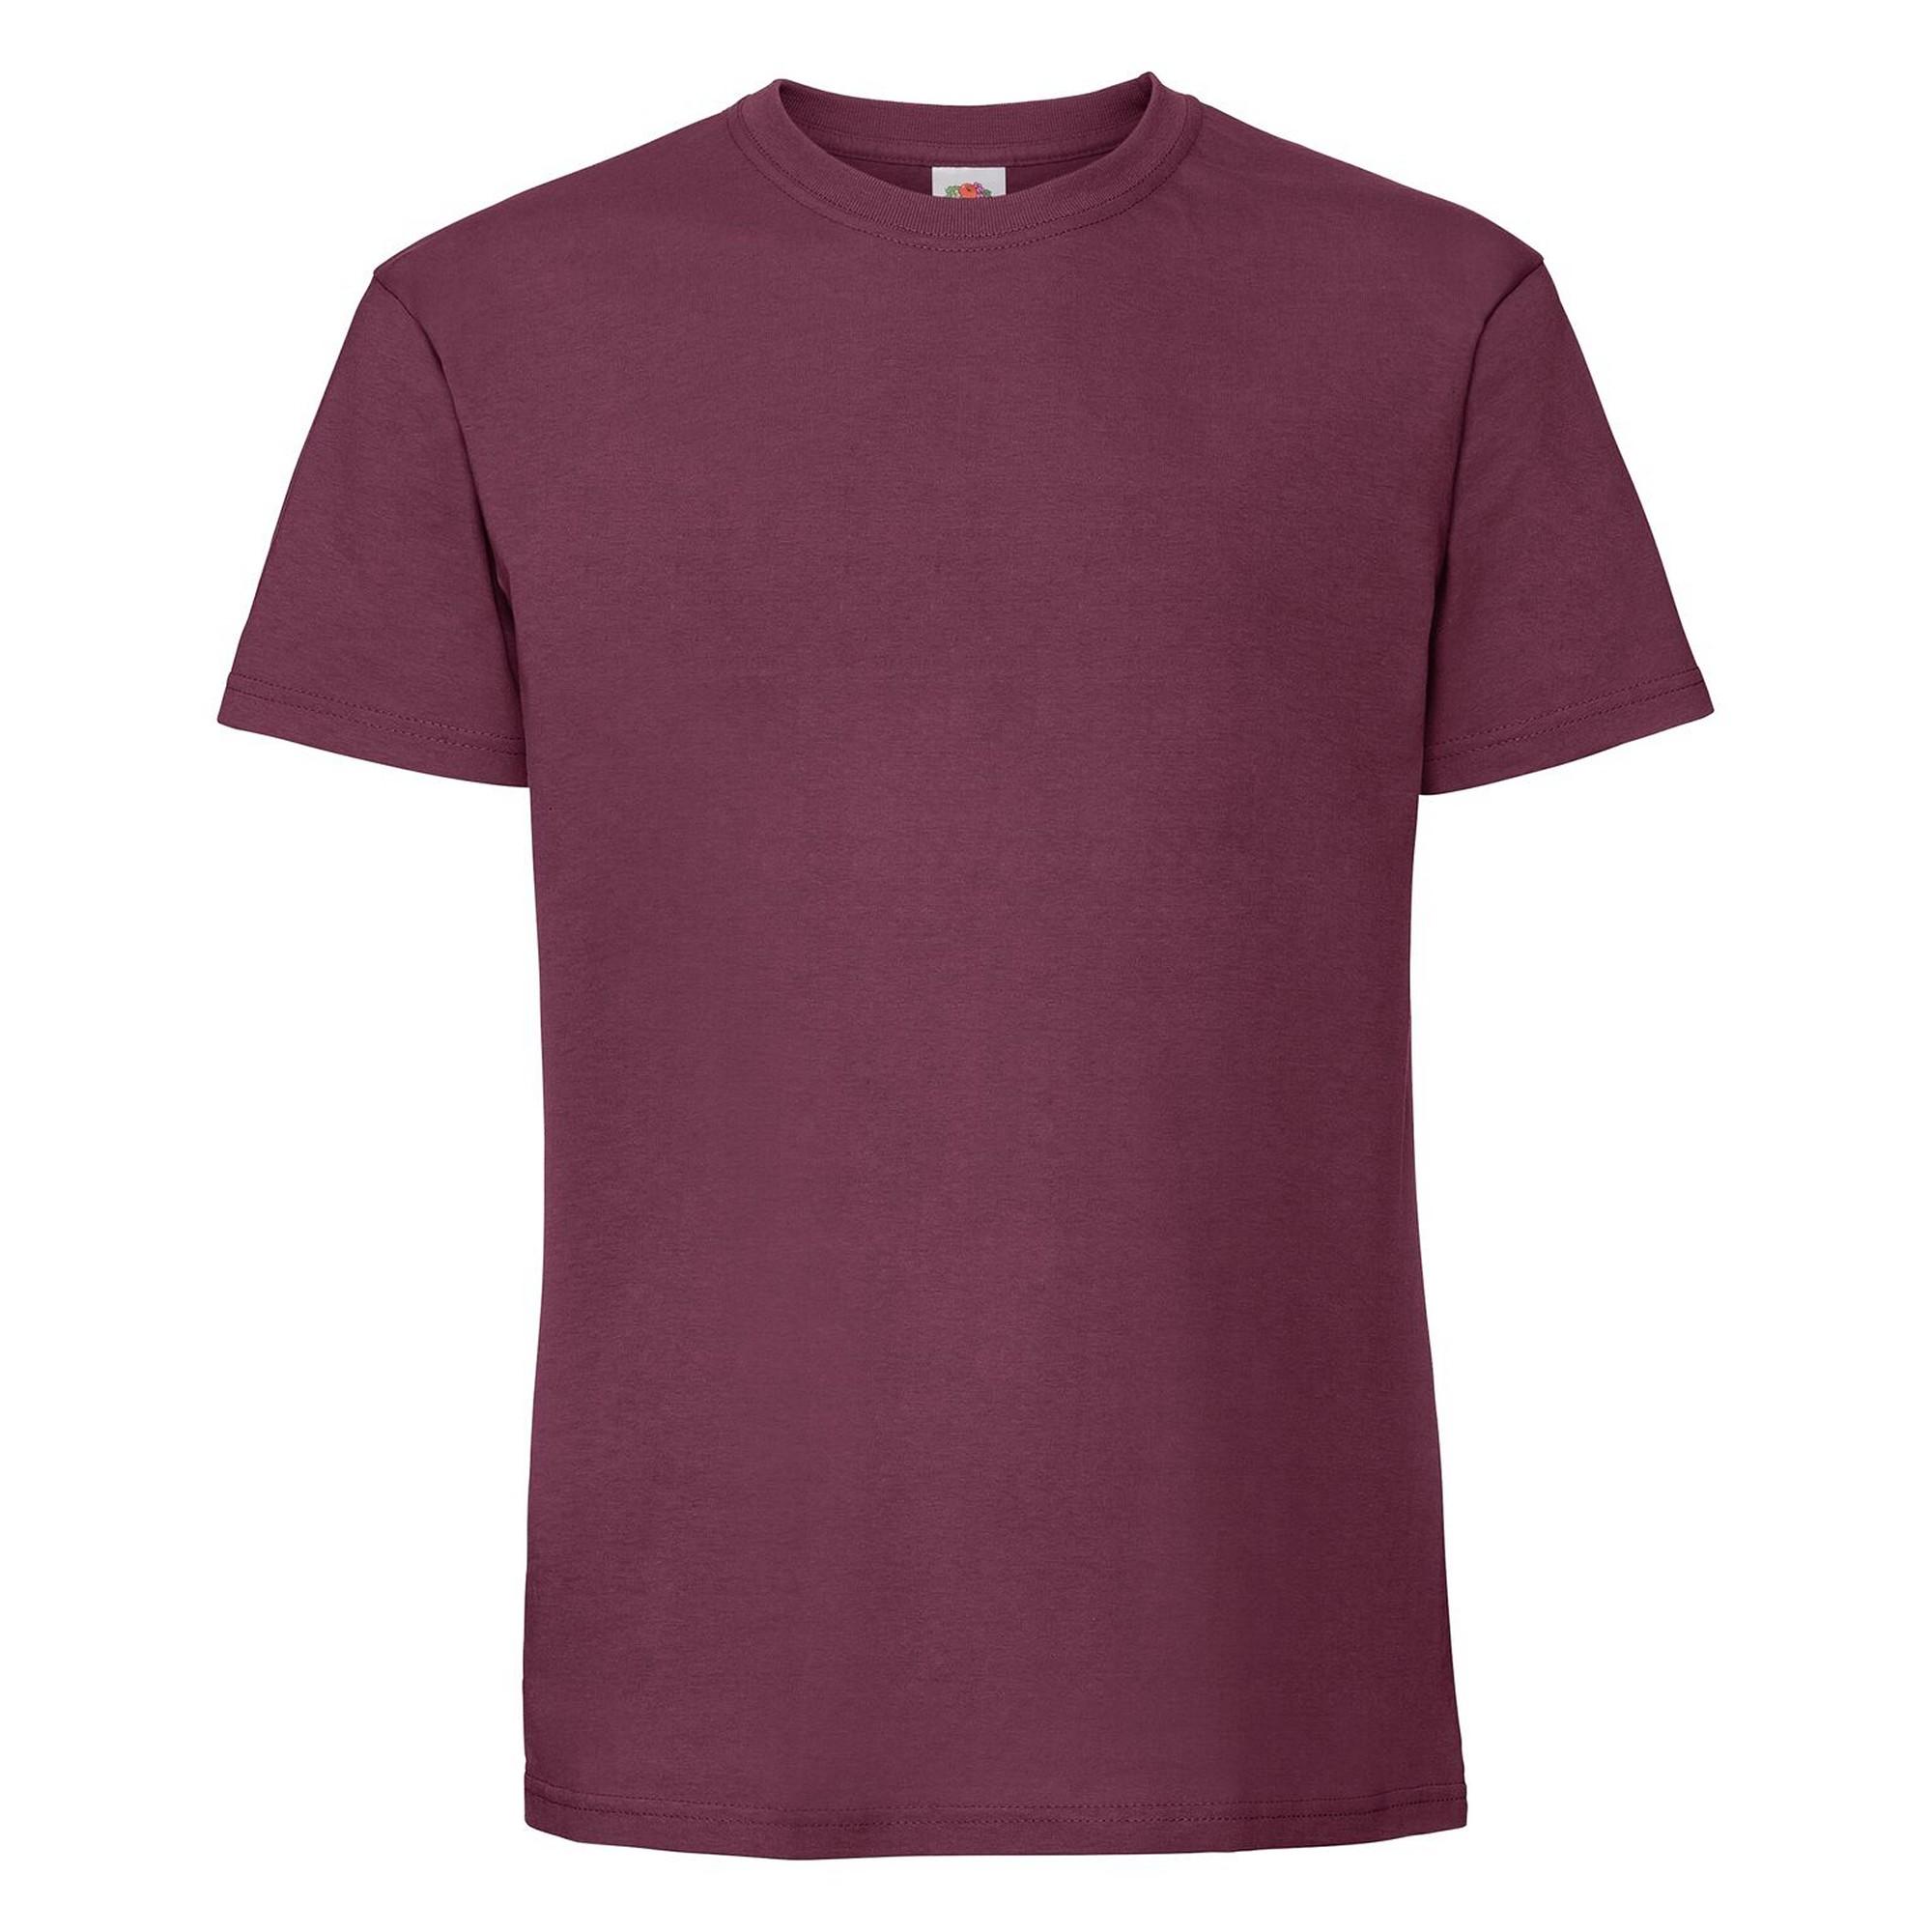 Fruit-Of-The-Loom-Camiseta-de-algodon-Ringspun-para-hombre-PC3033